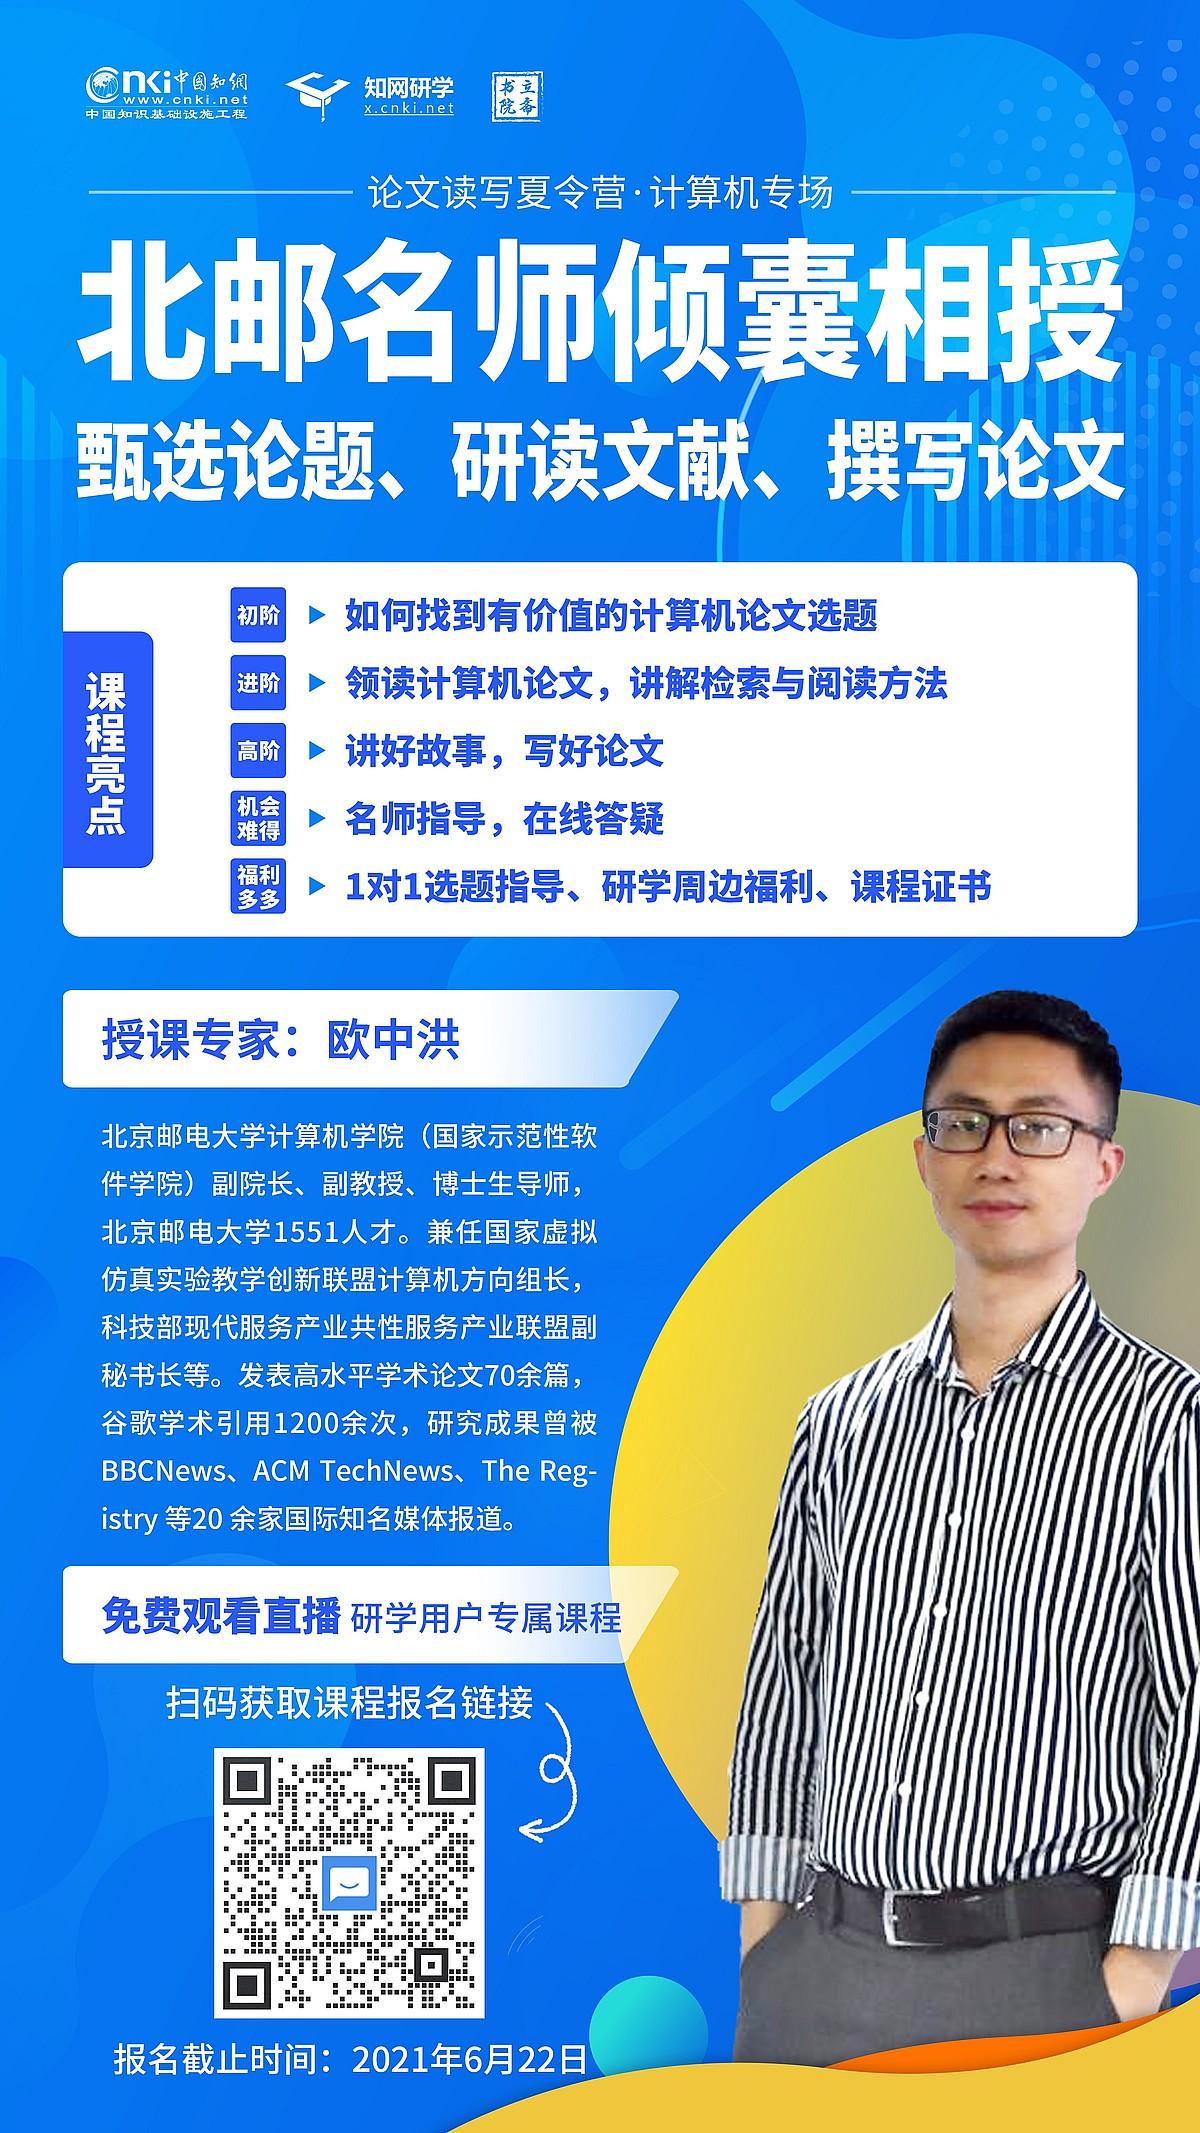 CNKI Webinar: 論文讀寫夏令營—計算機專場